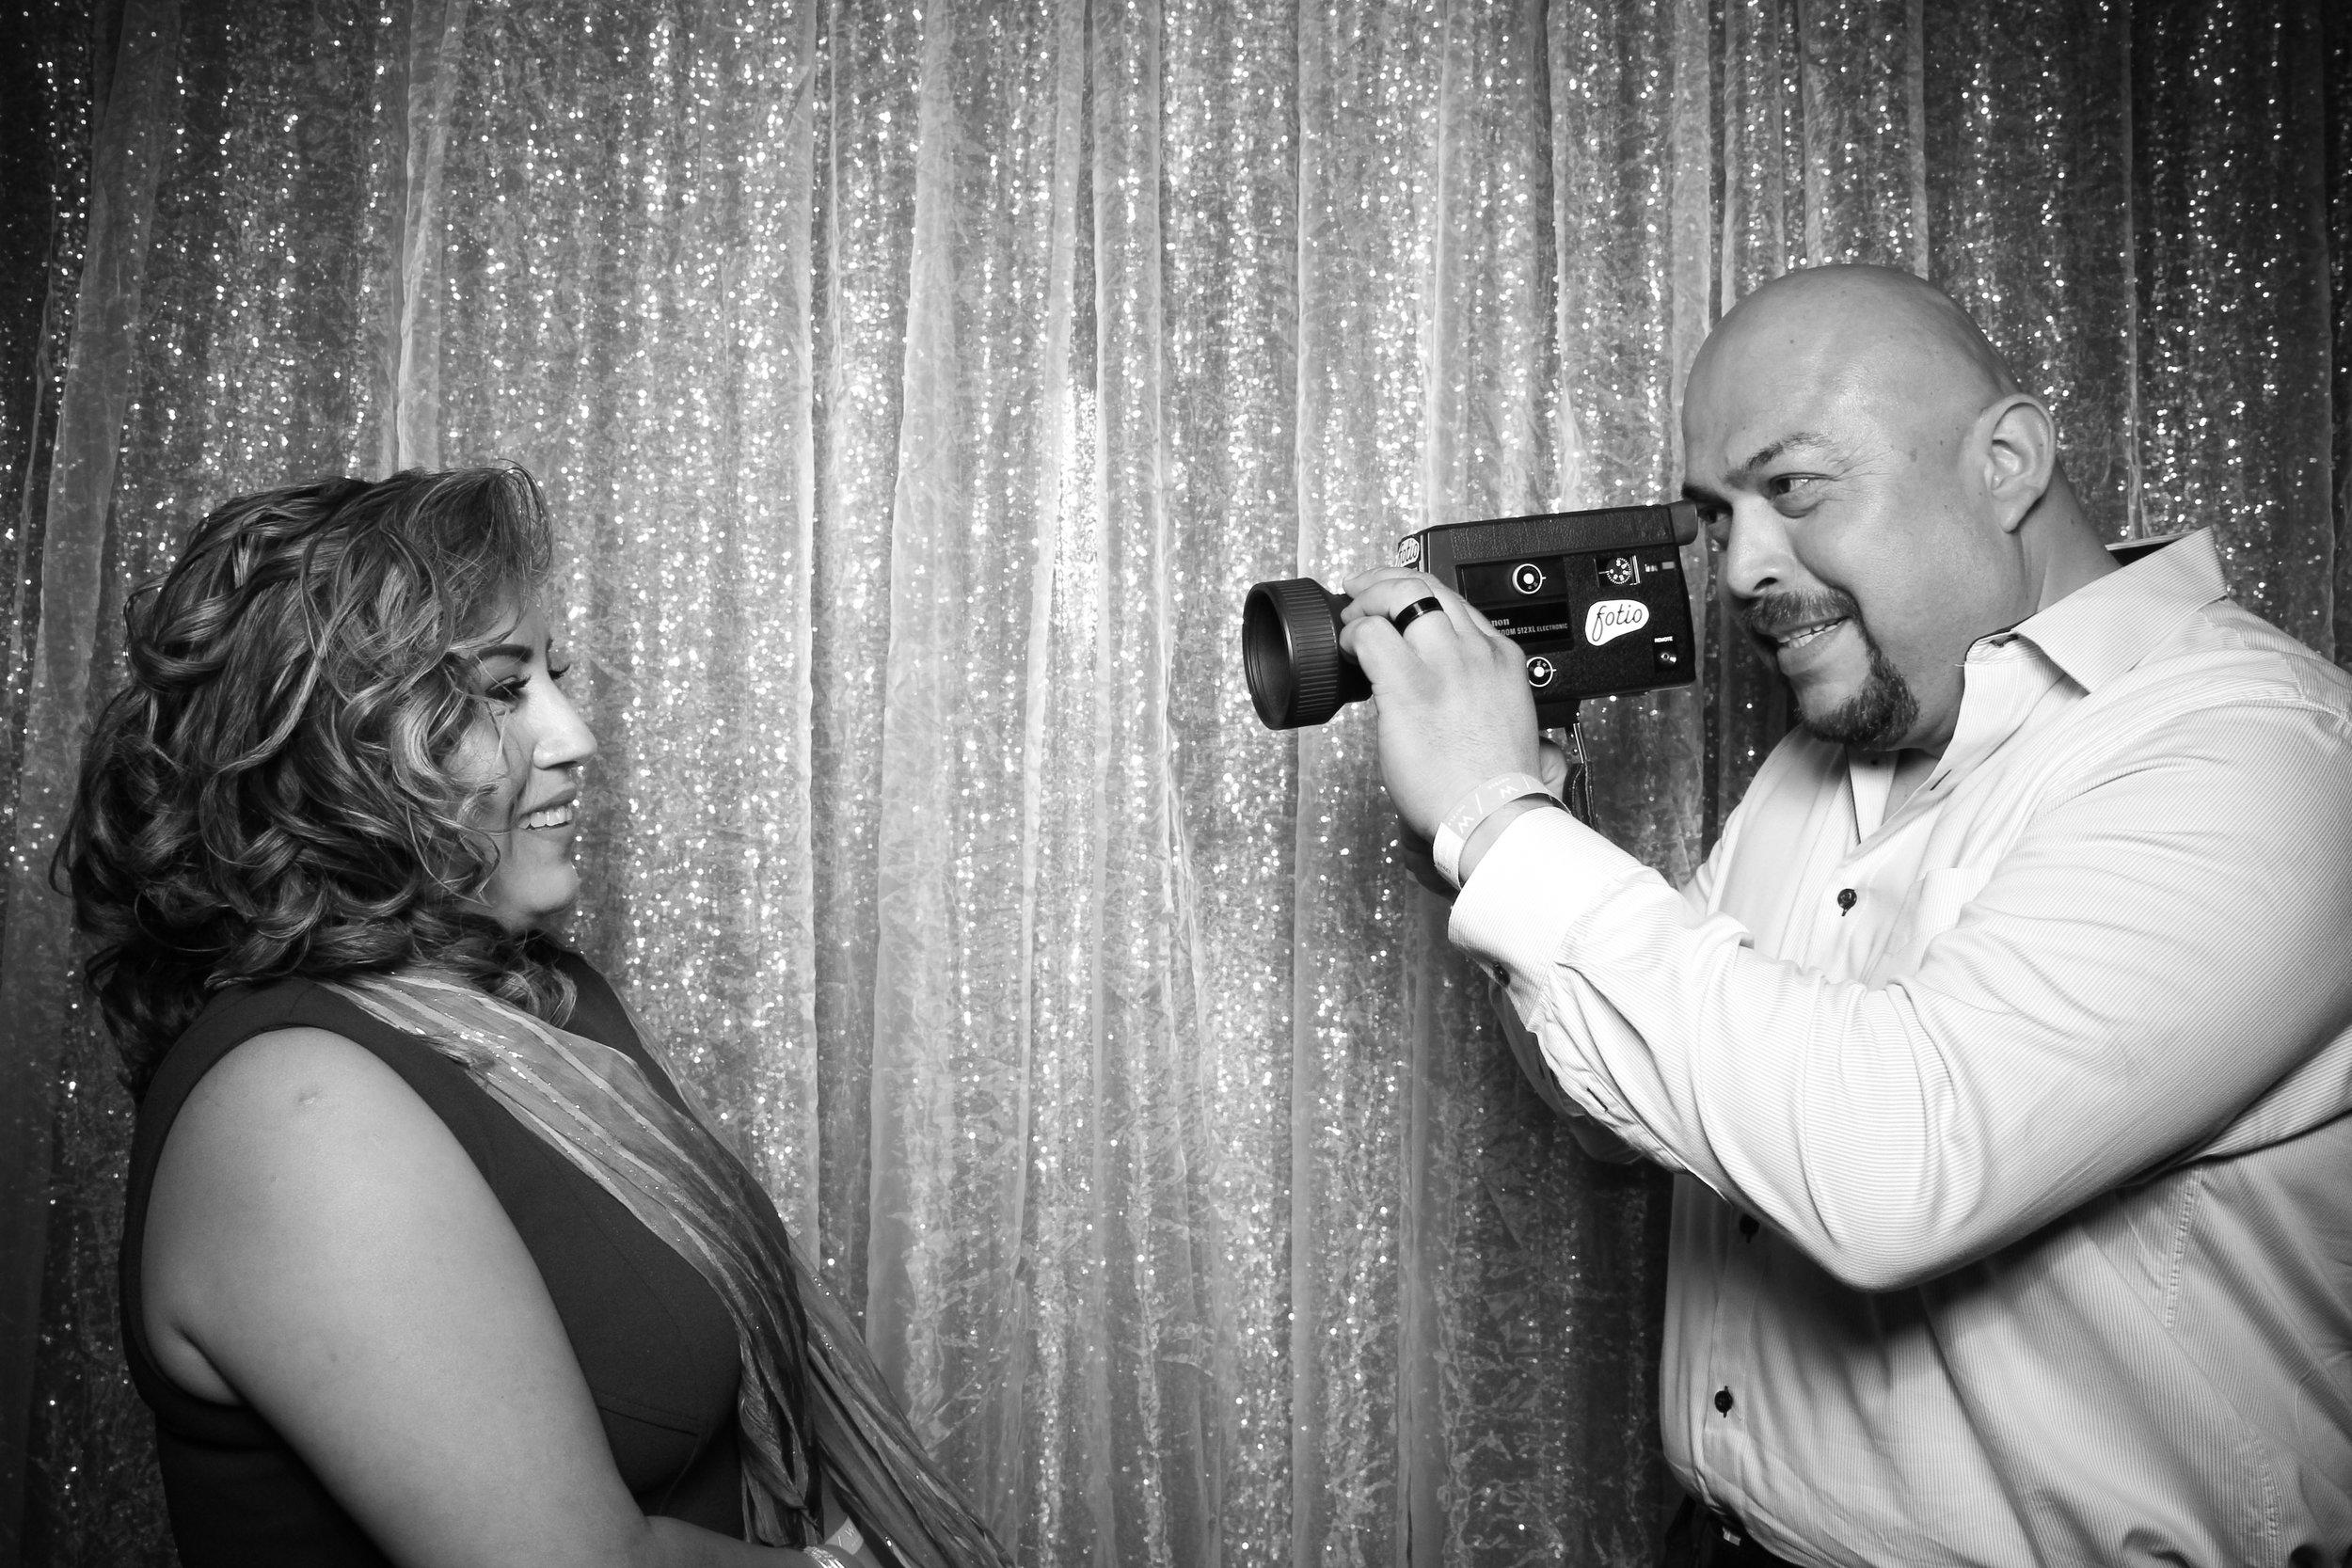 Chicago_Vintage_Wedding_Photobooth_W_Lakeshore_Hotel_04.jpg